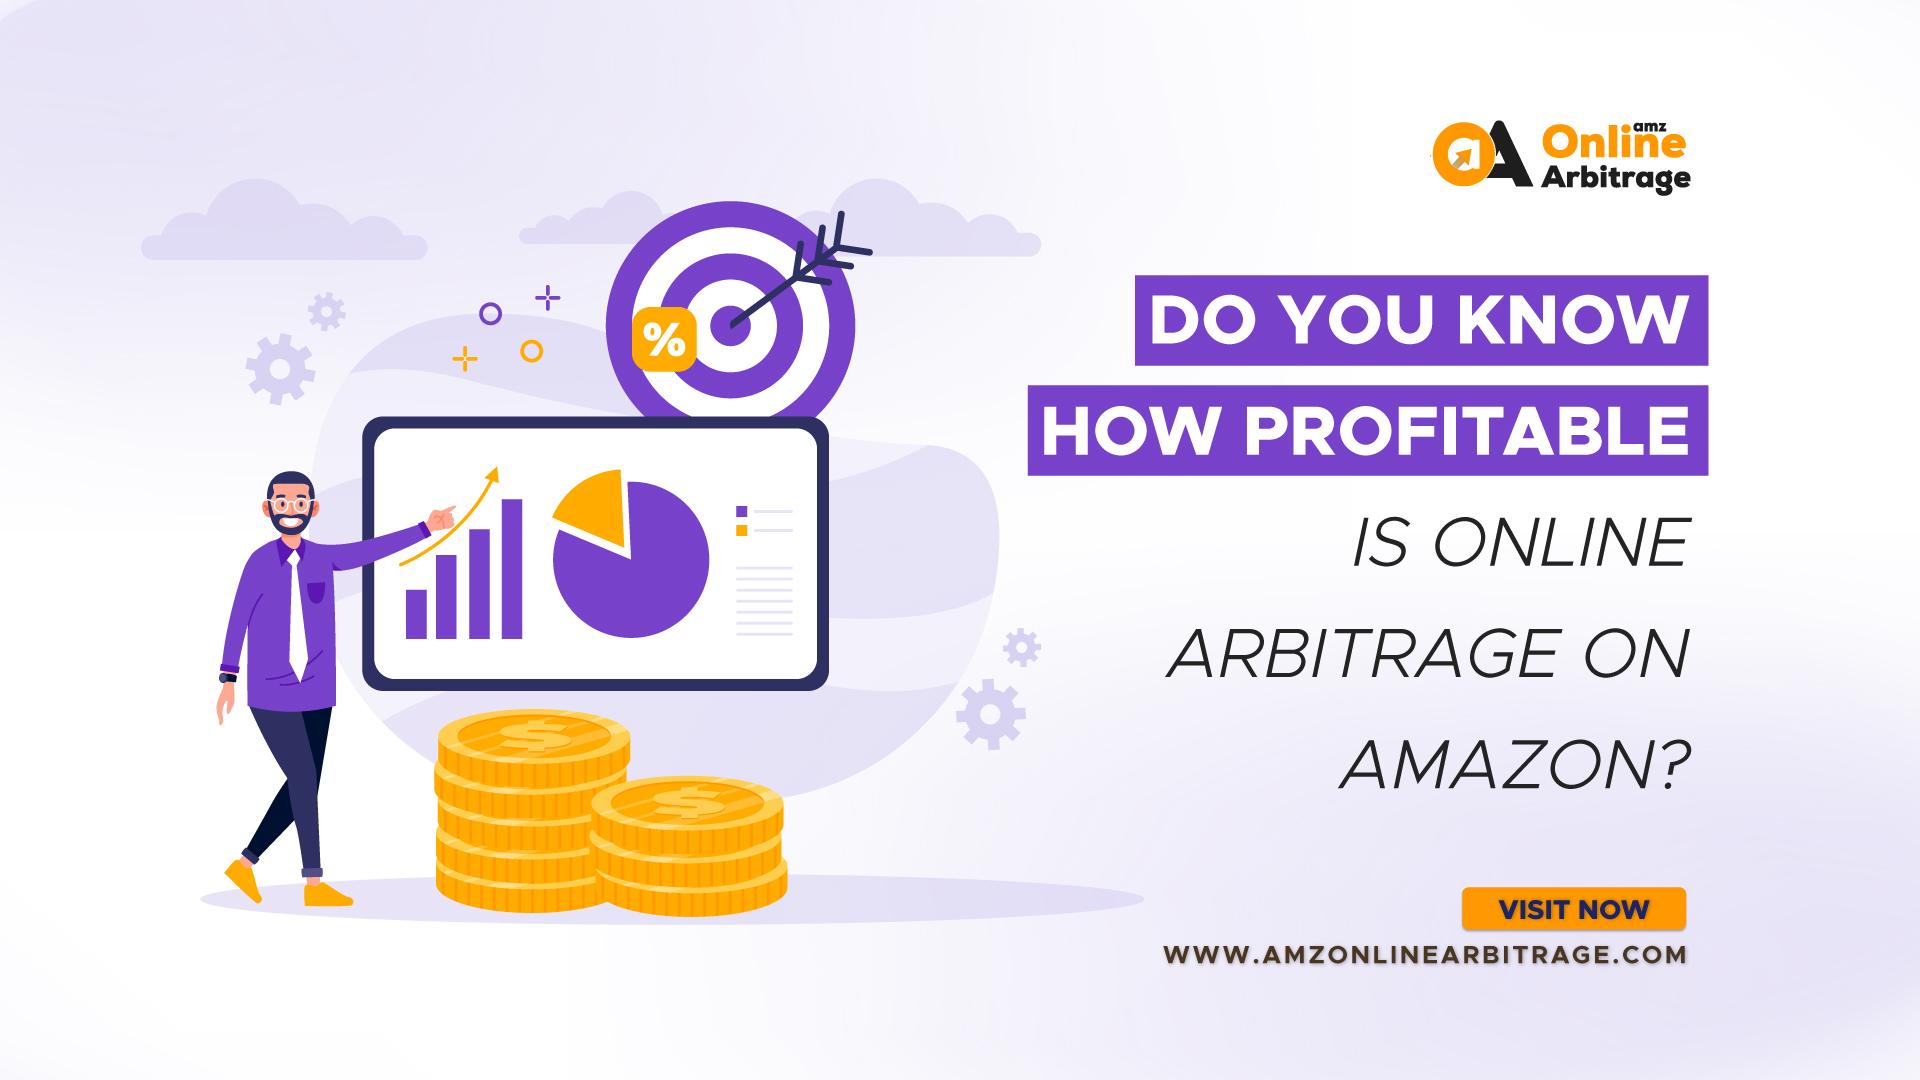 DO YOU KNOW HOW PROFITABLE IS ONLINE ARBITRAGE ON AMAZON?